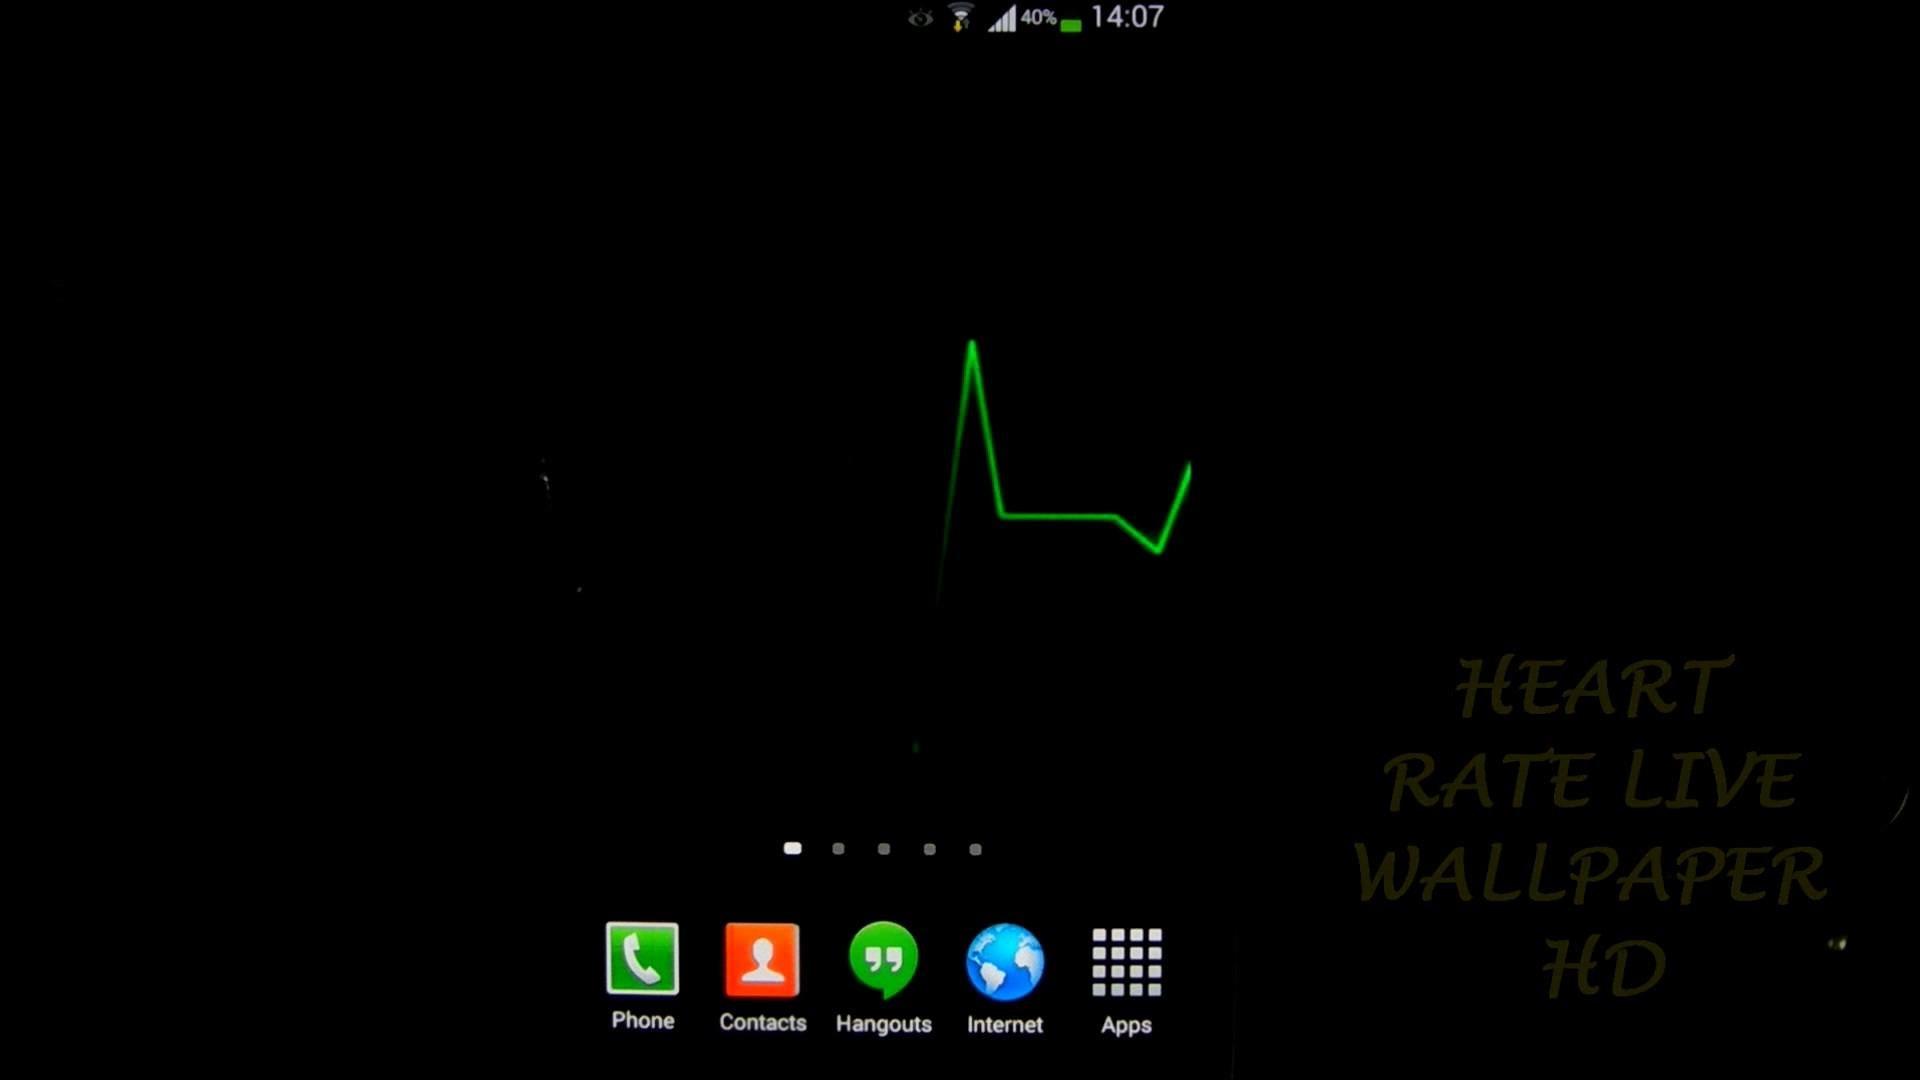 Heart Rate Live Wallpaper HD